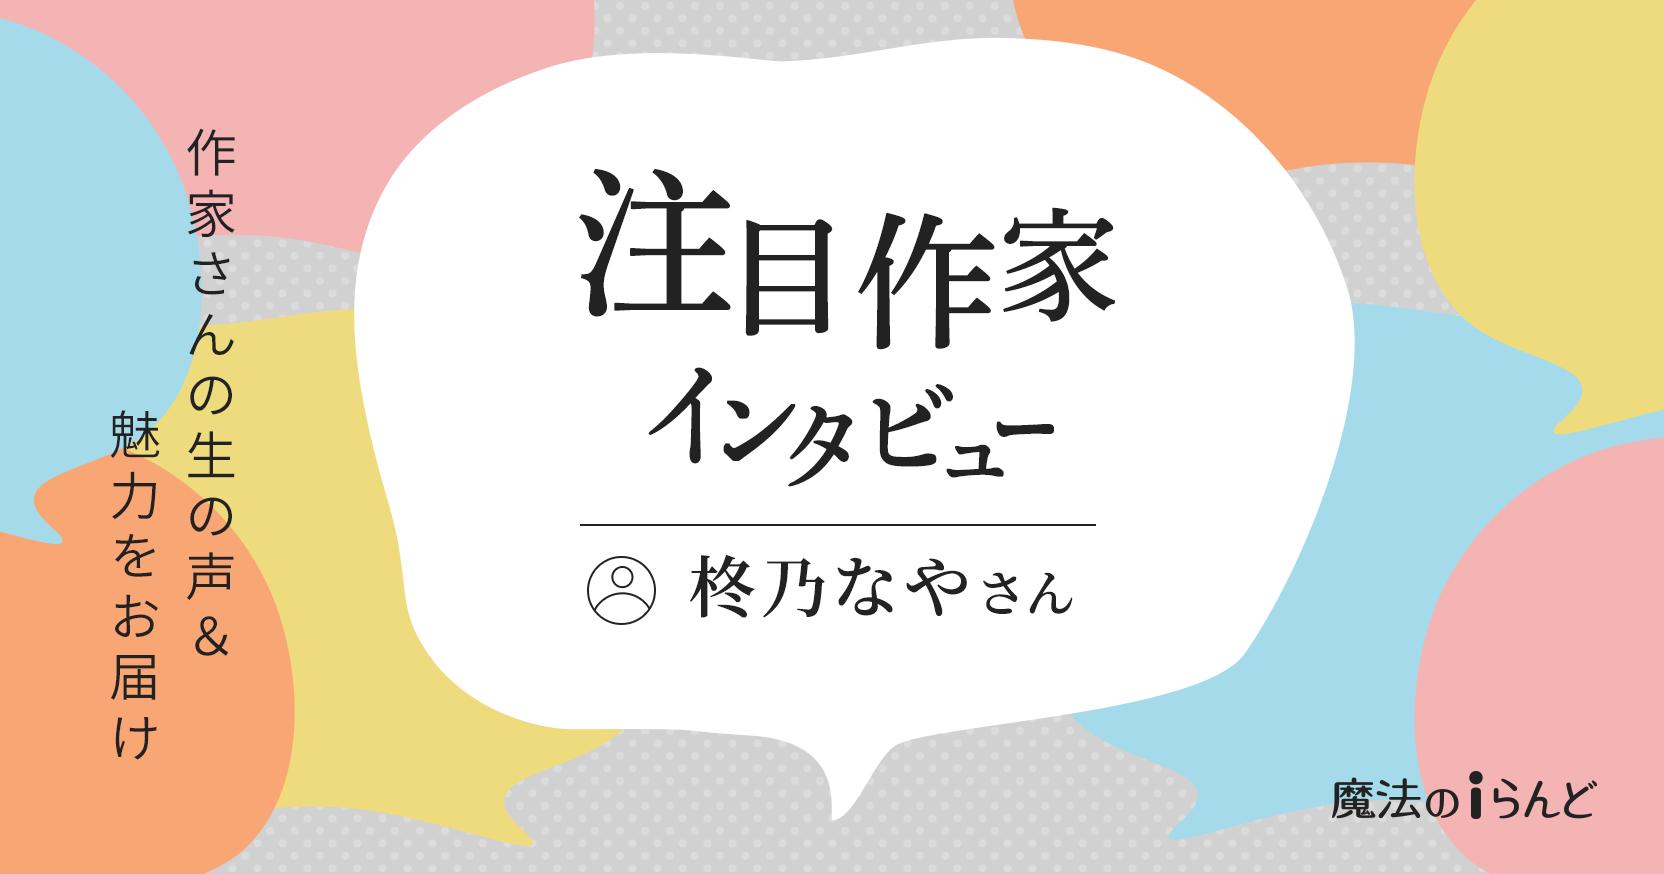 https://storage.googleapis.com/blog-info/entry/2021/09/210927interview_shuno_ogp.png